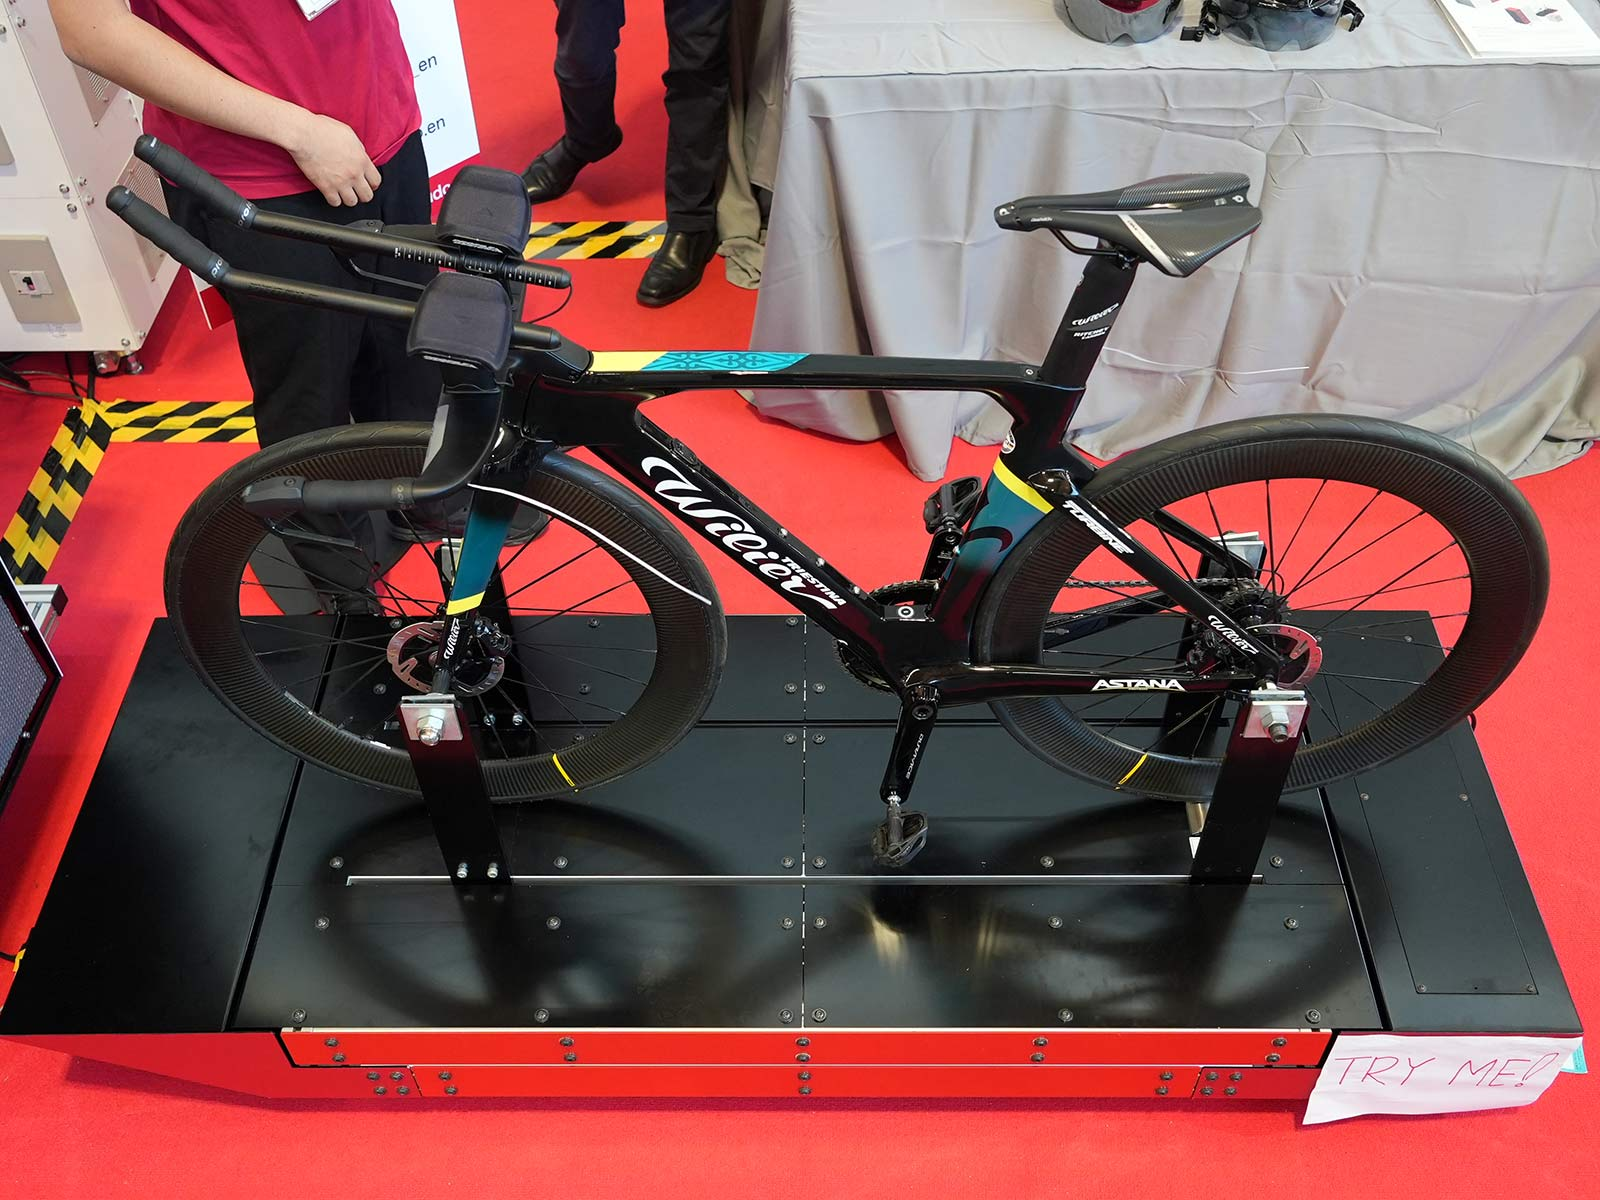 bicycle on a strain gauge platform for measuring aerodynamic drag in the portable aero optim wind tunnel